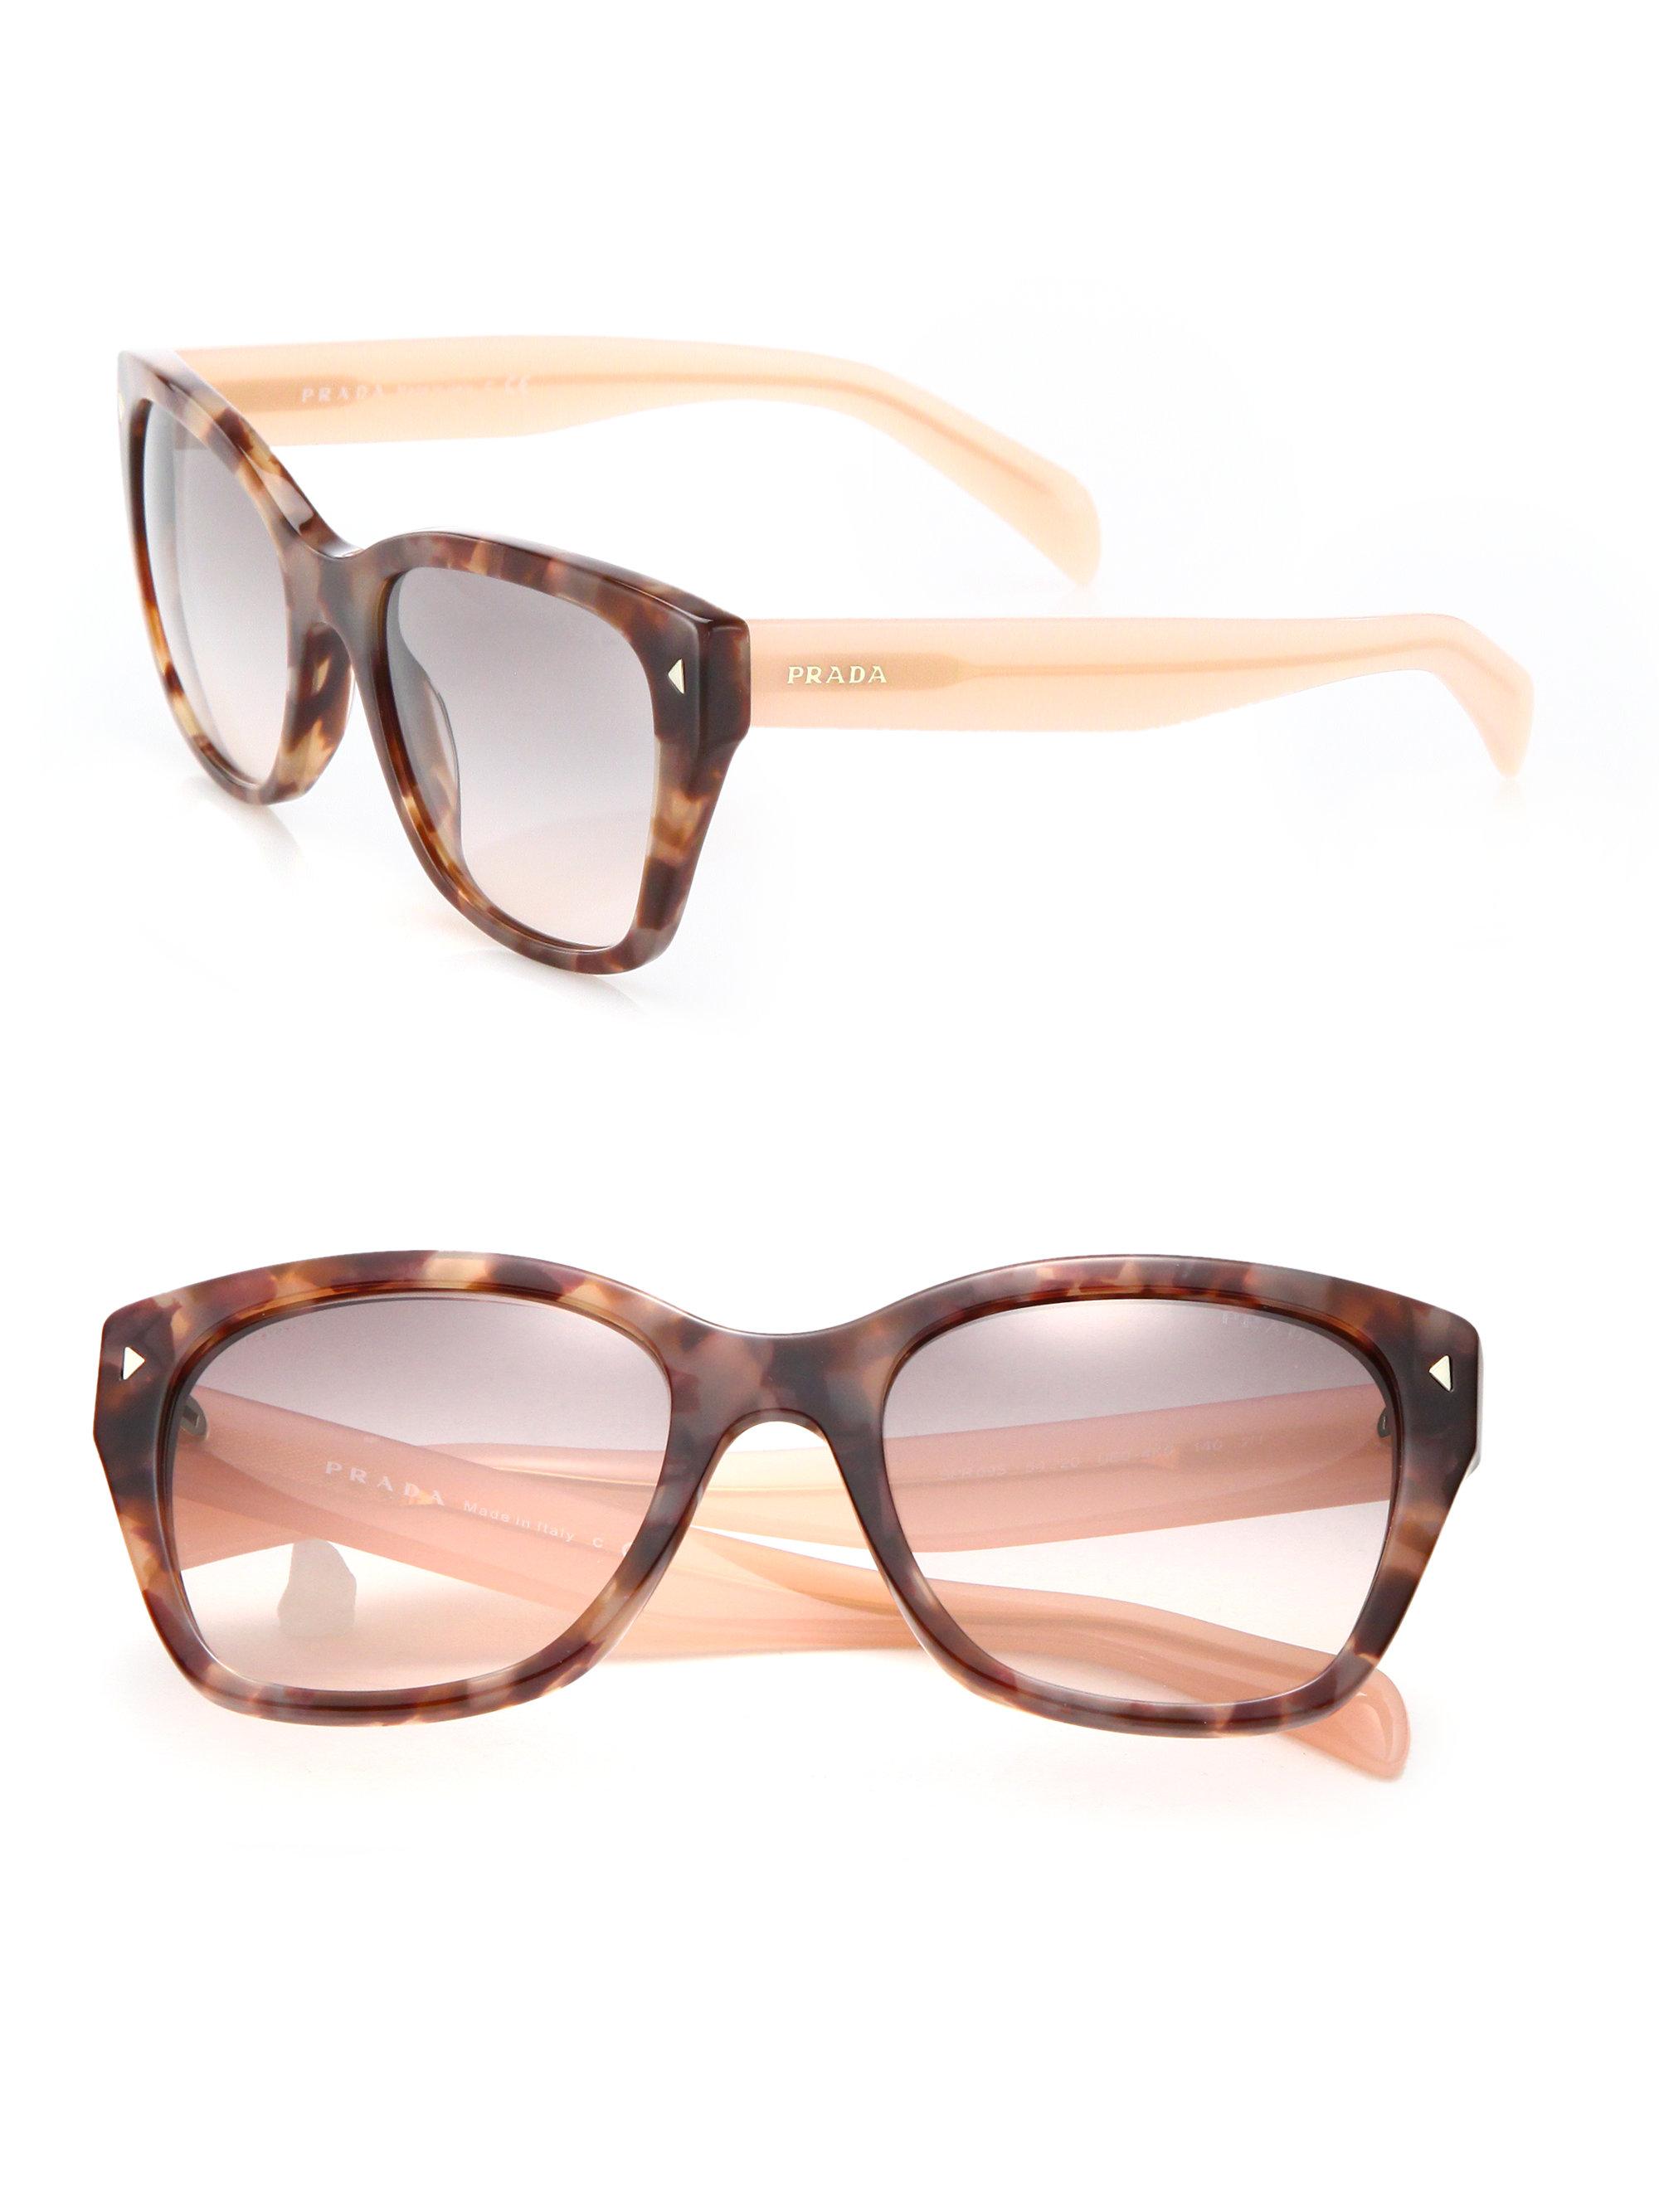 cdb73864ca6b spain lyst prada 54mm square acetate sunglasses in pink 8db98 8bbba